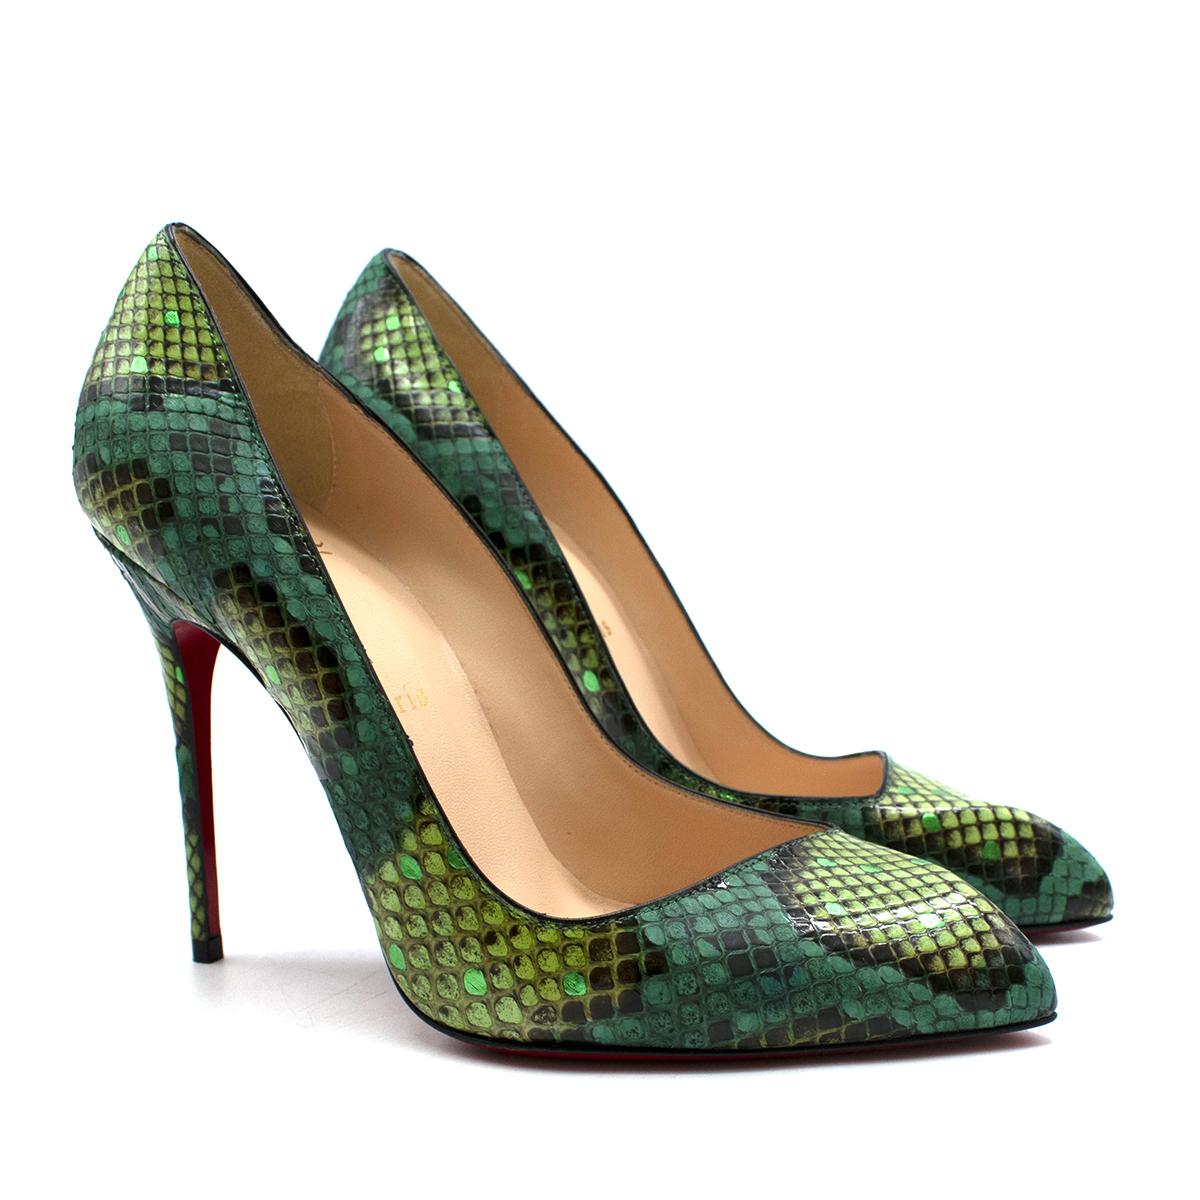 Christian Louboutin Green Snakeskin Pumps